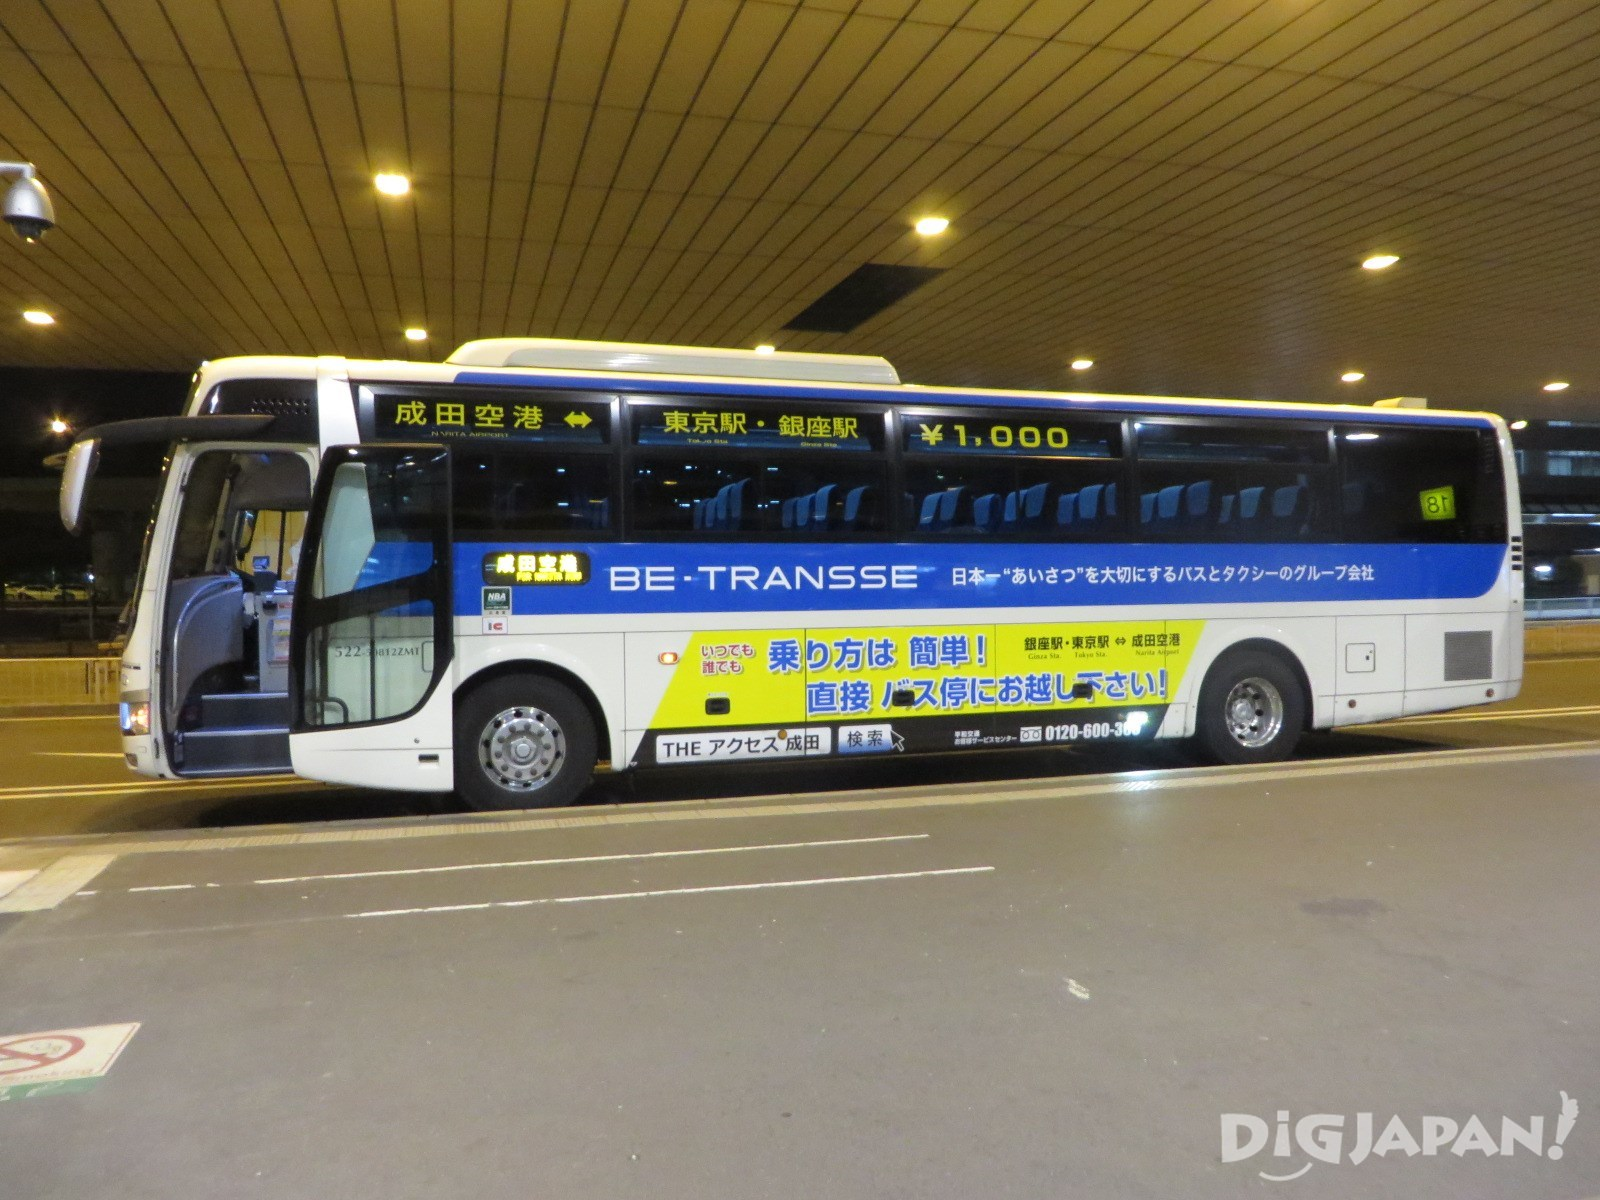 THE 액세스 나리타 버스는 파란색과 흰색의 버스예요.